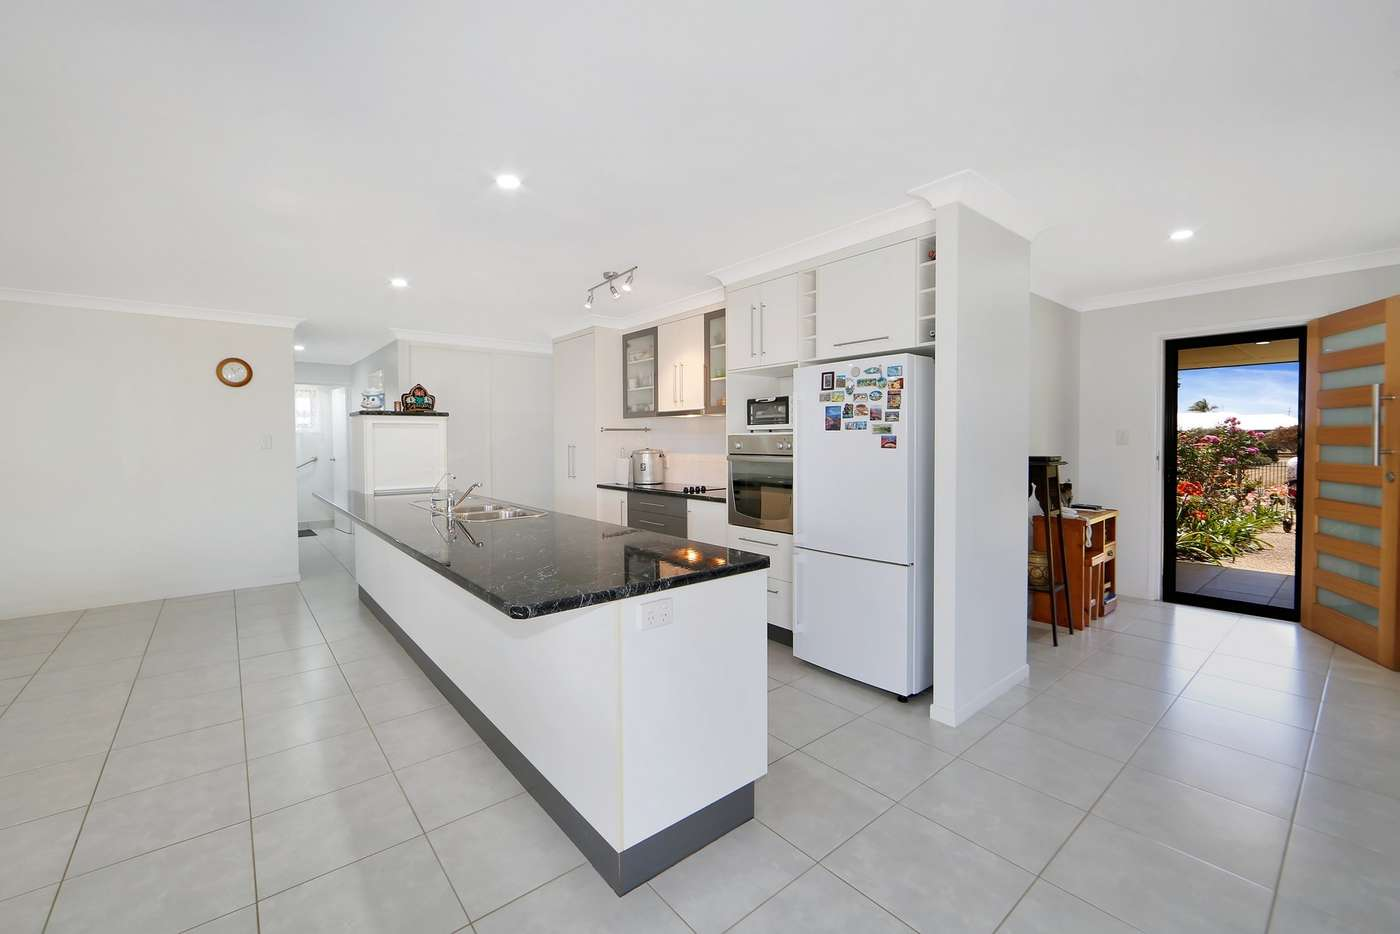 Seventh view of Homely house listing, 20 NEPTUNE Street, Burnett Heads QLD 4670